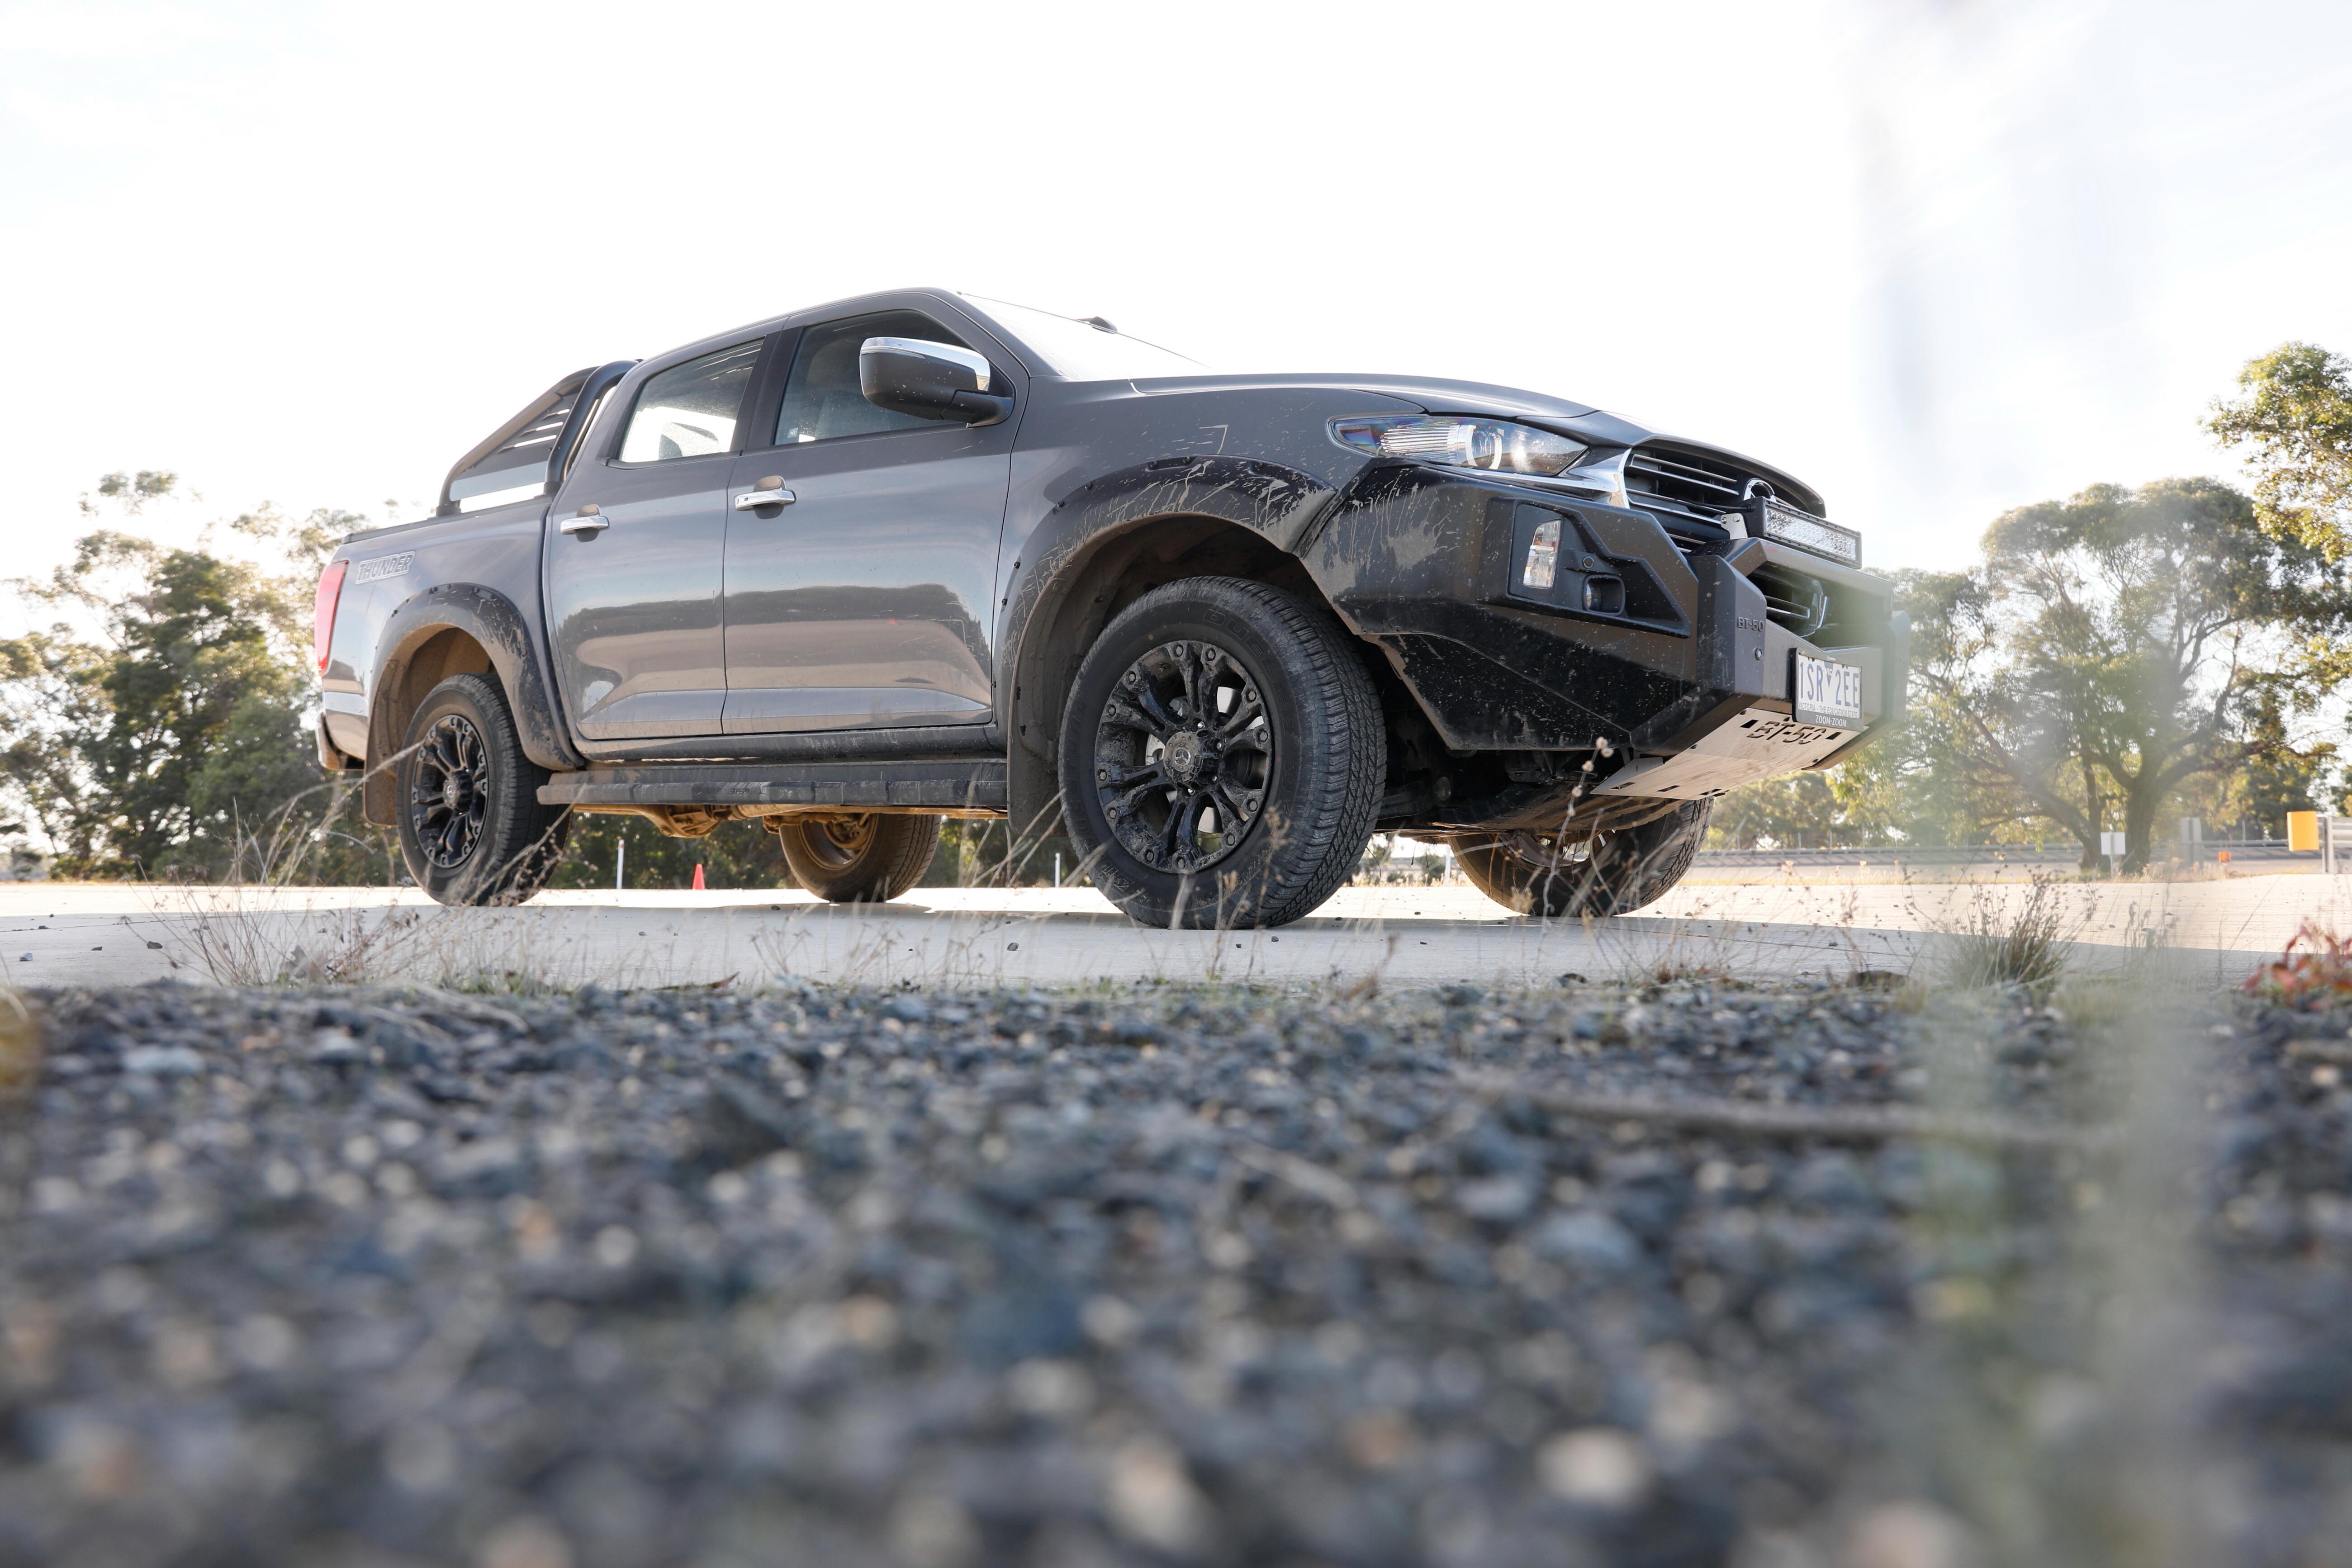 4 X 4 Australia Comparisons 2021 May 21 Mazda BT 50 Thunder Front